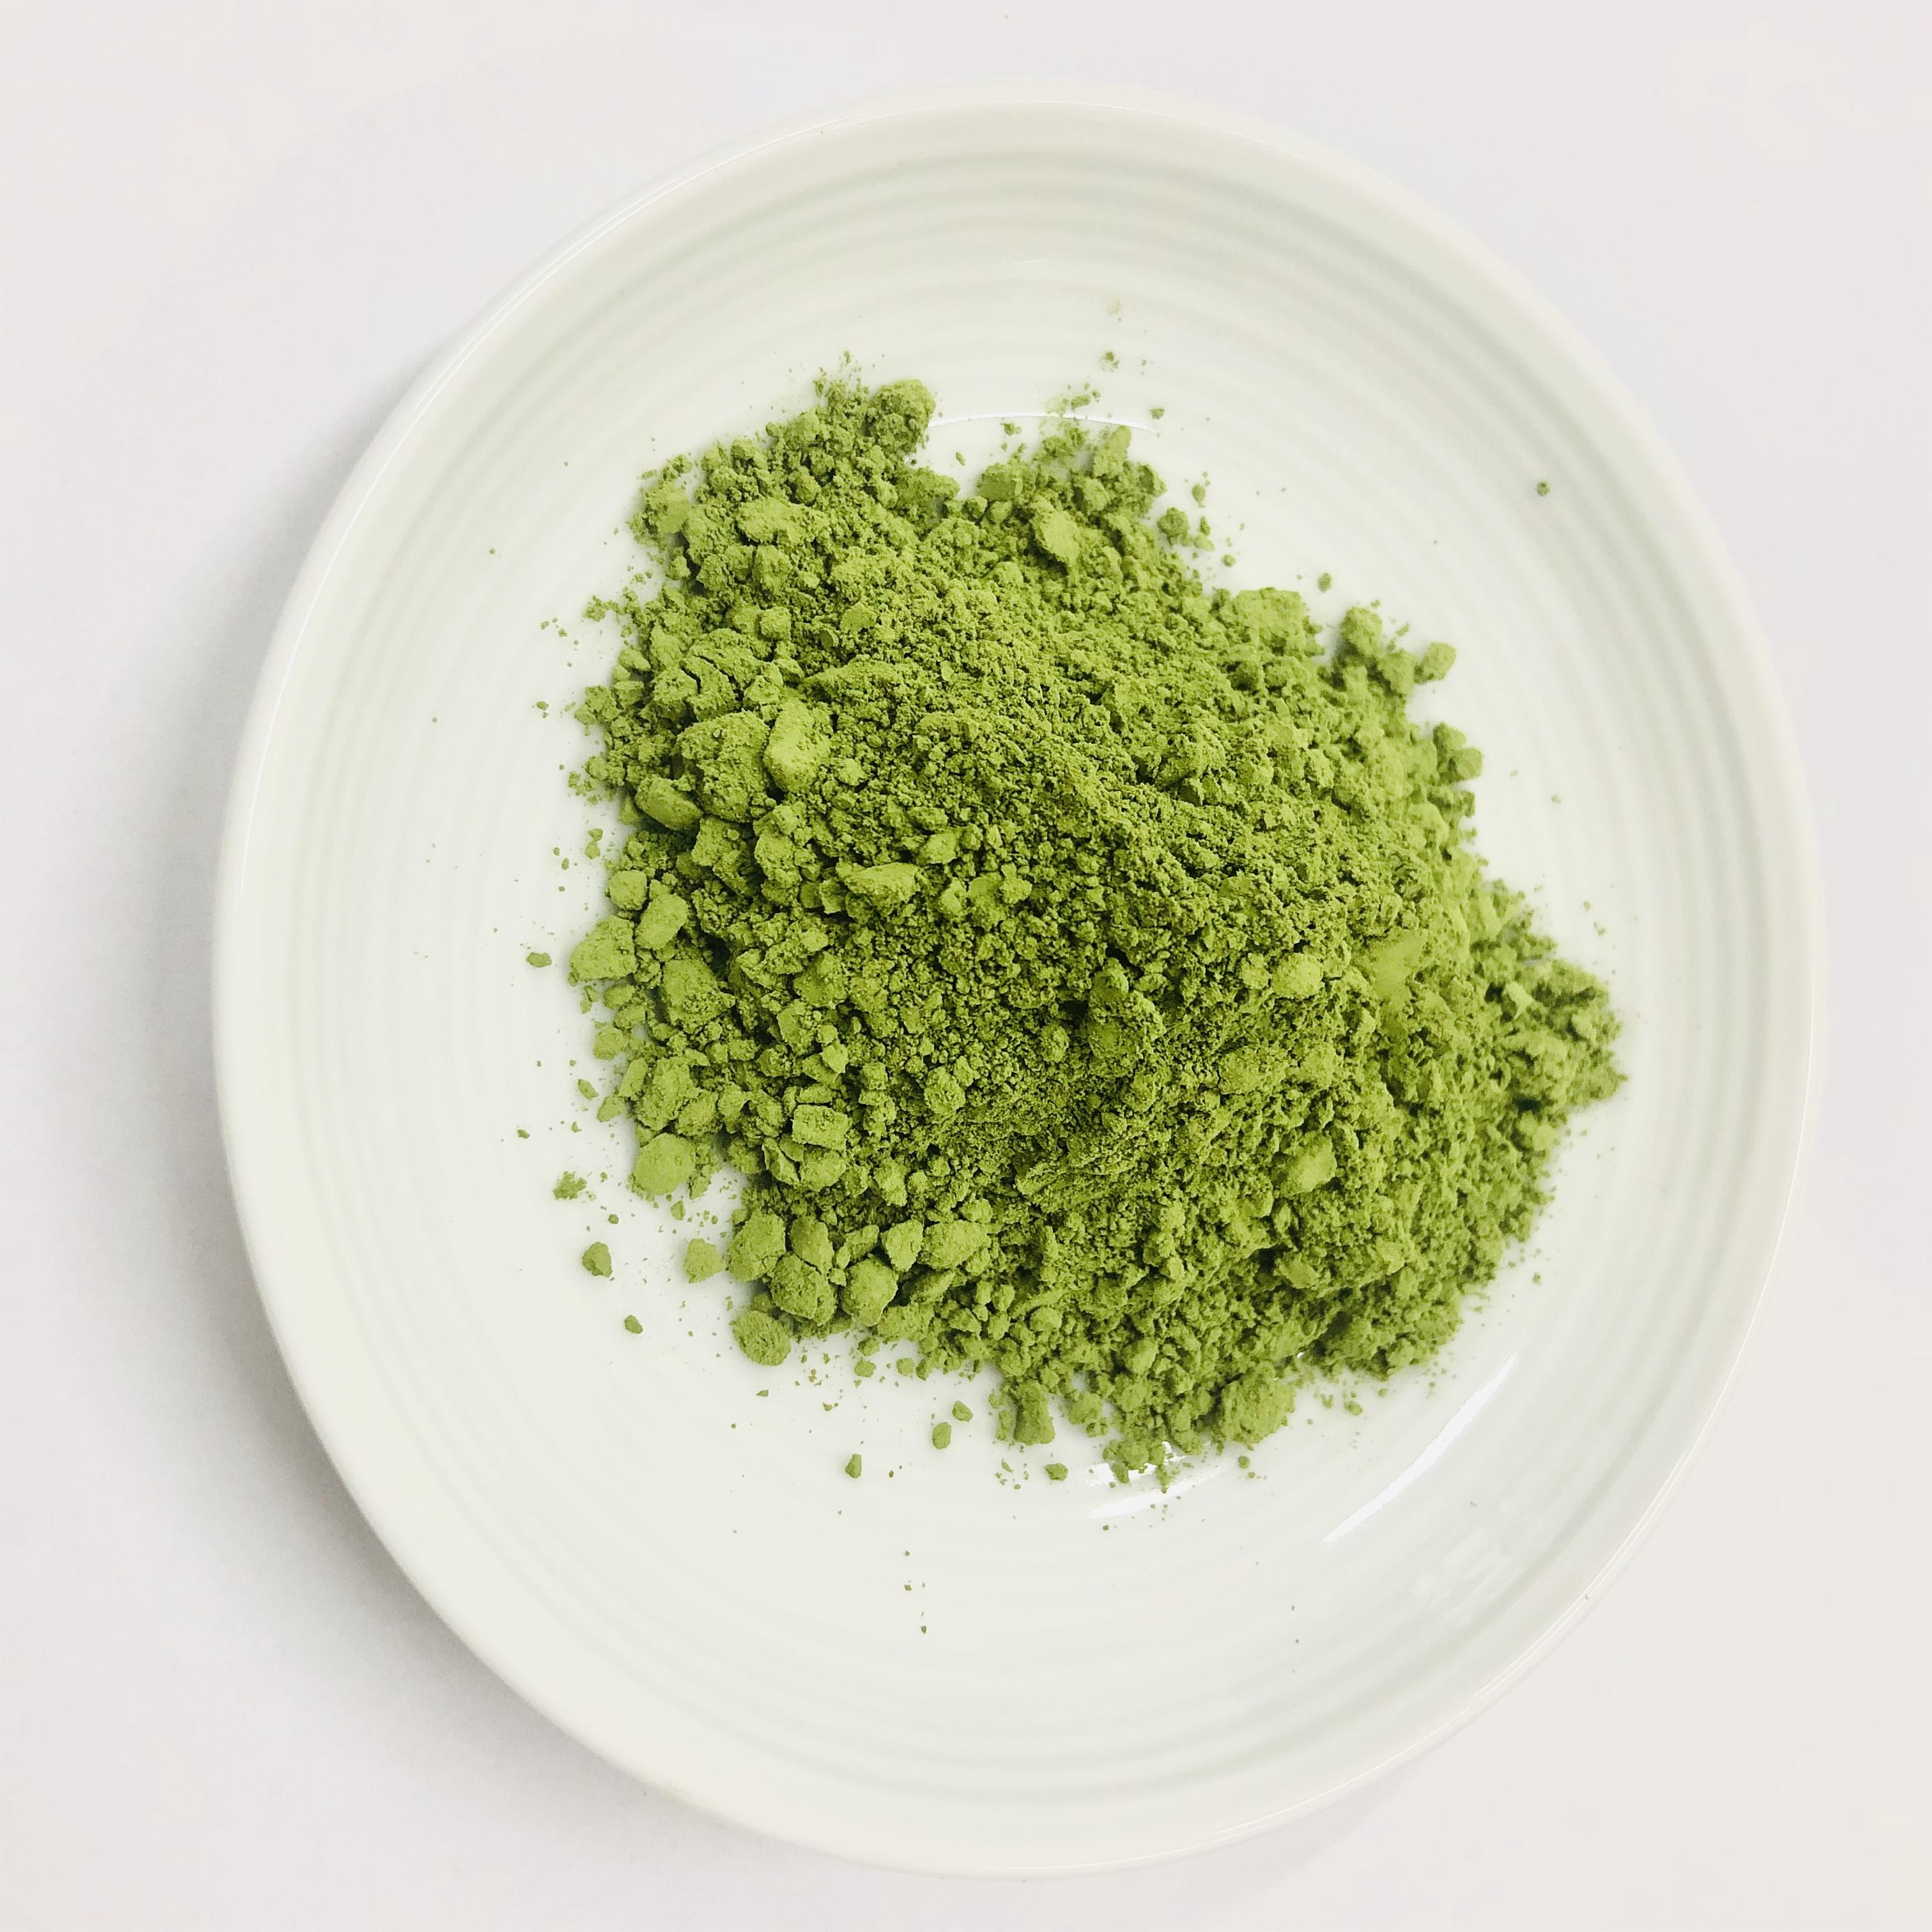 Organic Matcha Tea Matcha Powder With Distinct Taste - 4uTea | 4uTea.com